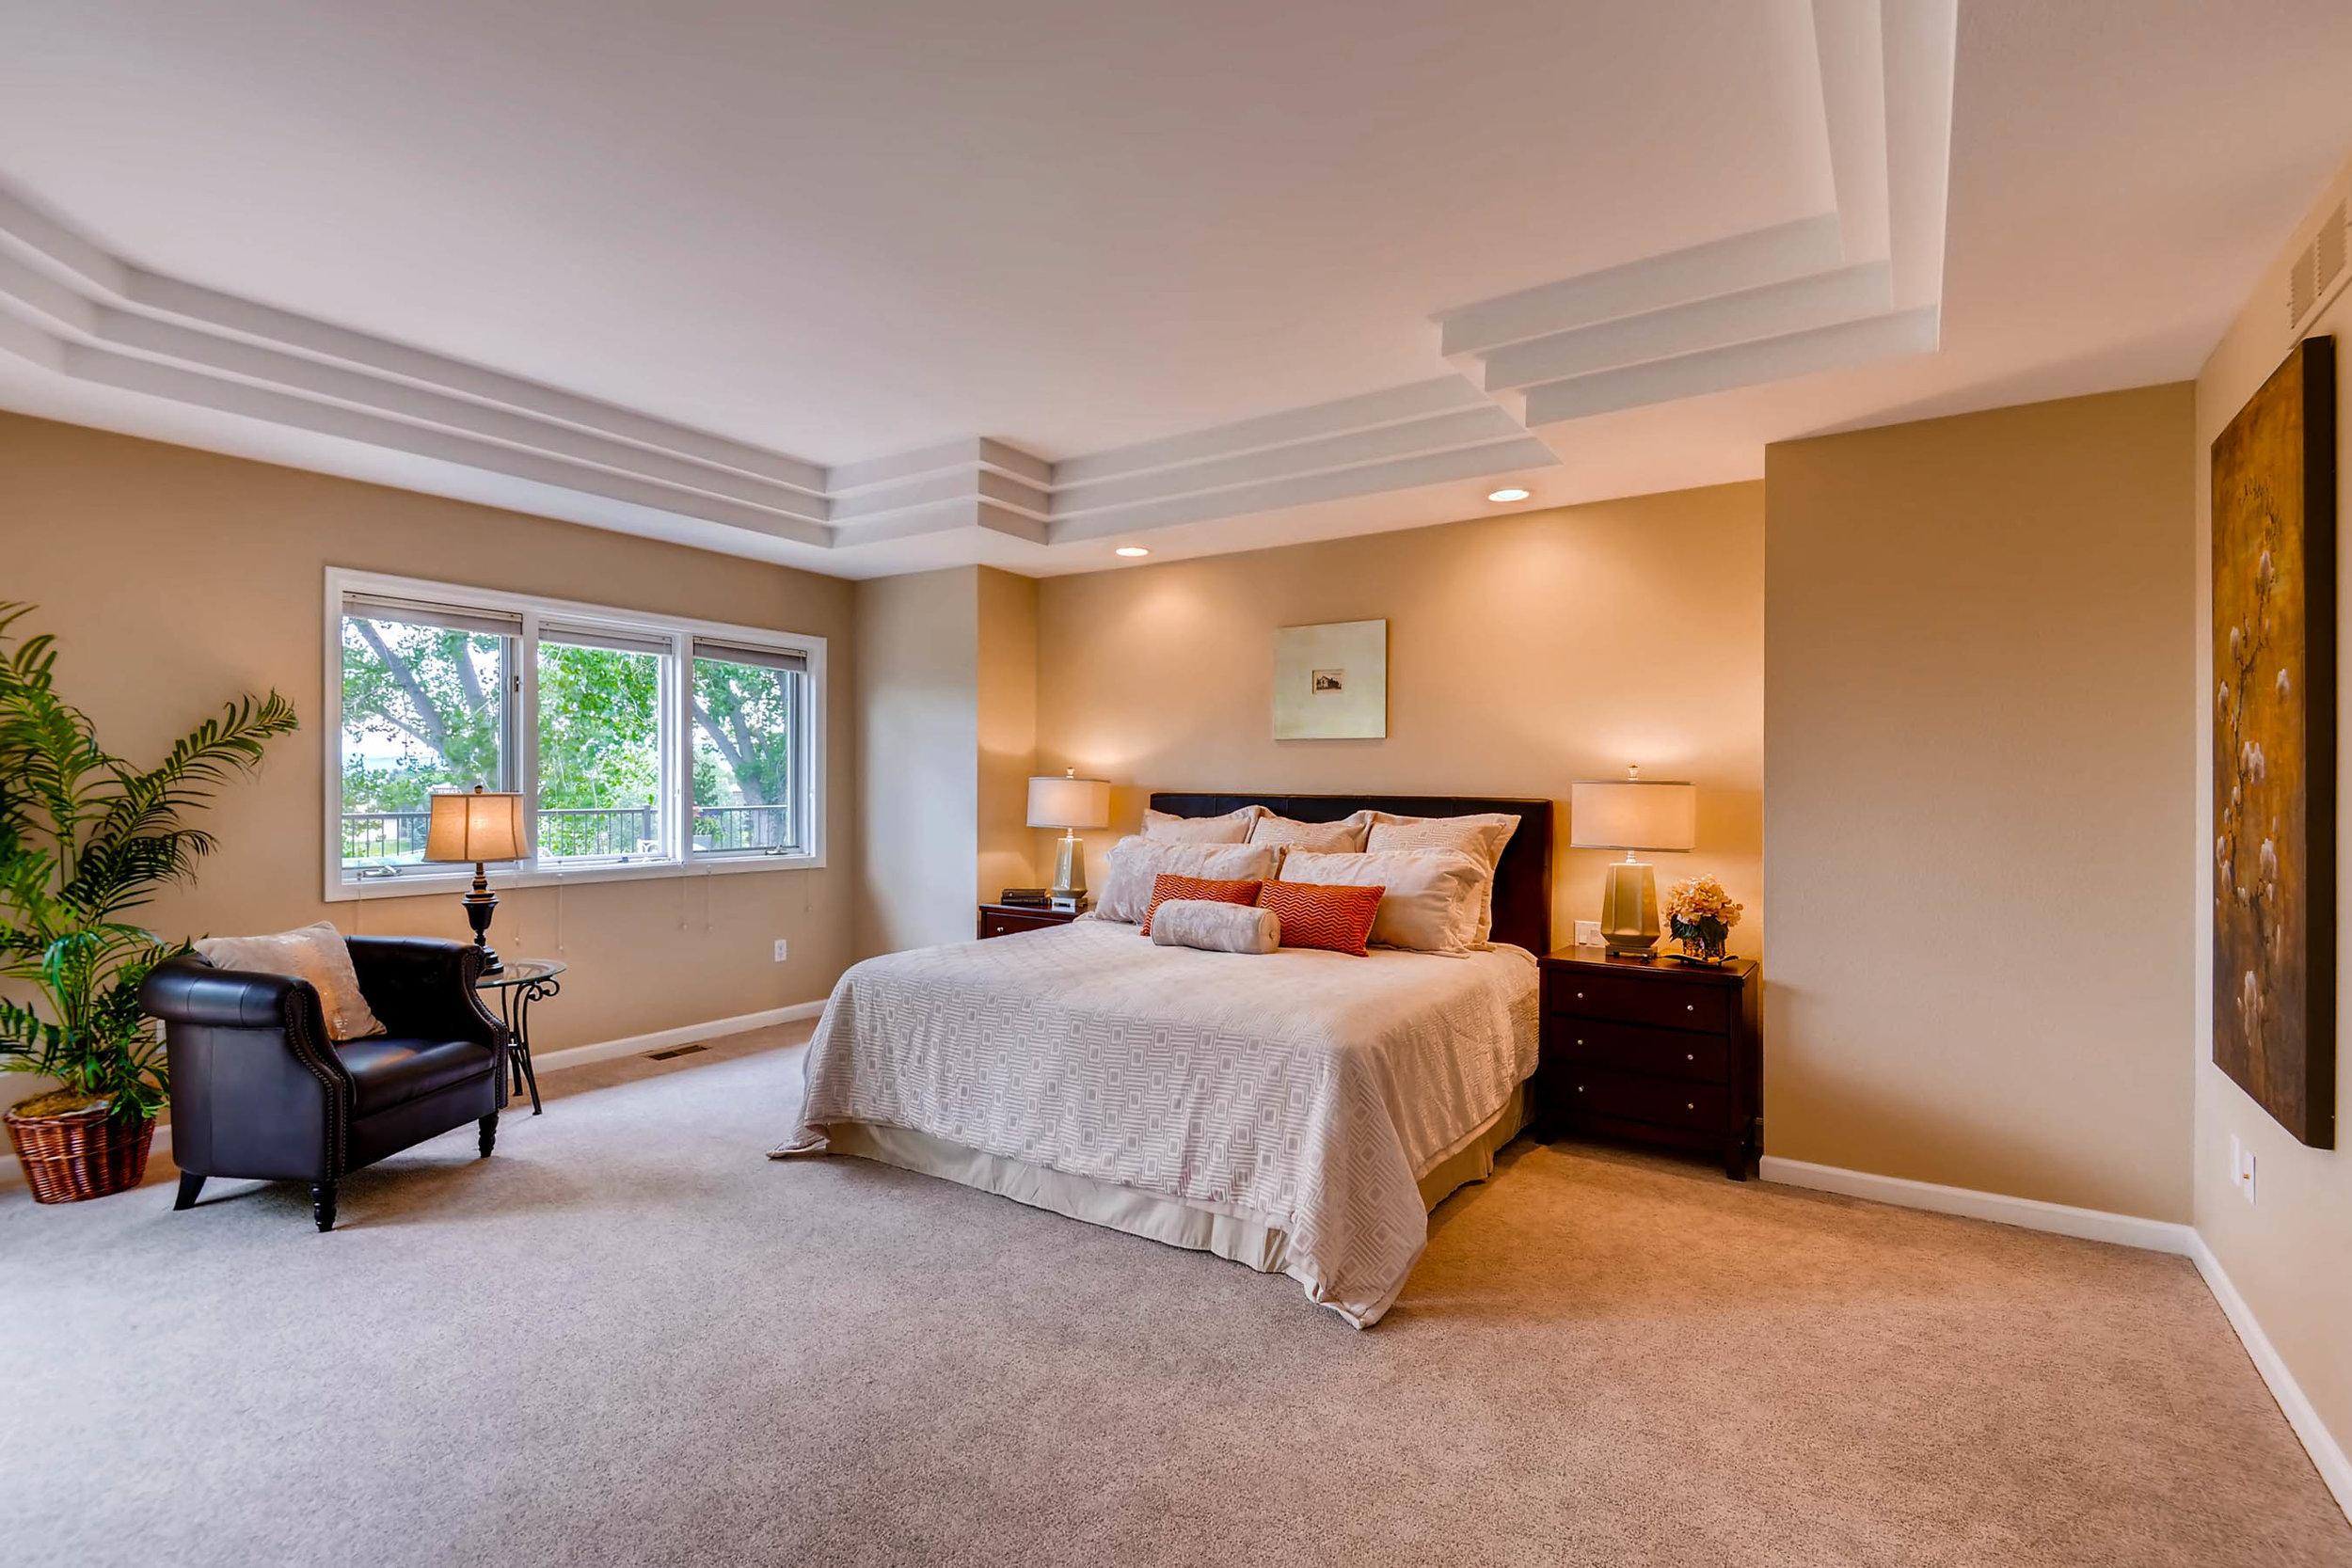 2449 S Yank Ct Lakewood CO-print-016-26-Master Bedroom-2700x1800-300dpi.jpg